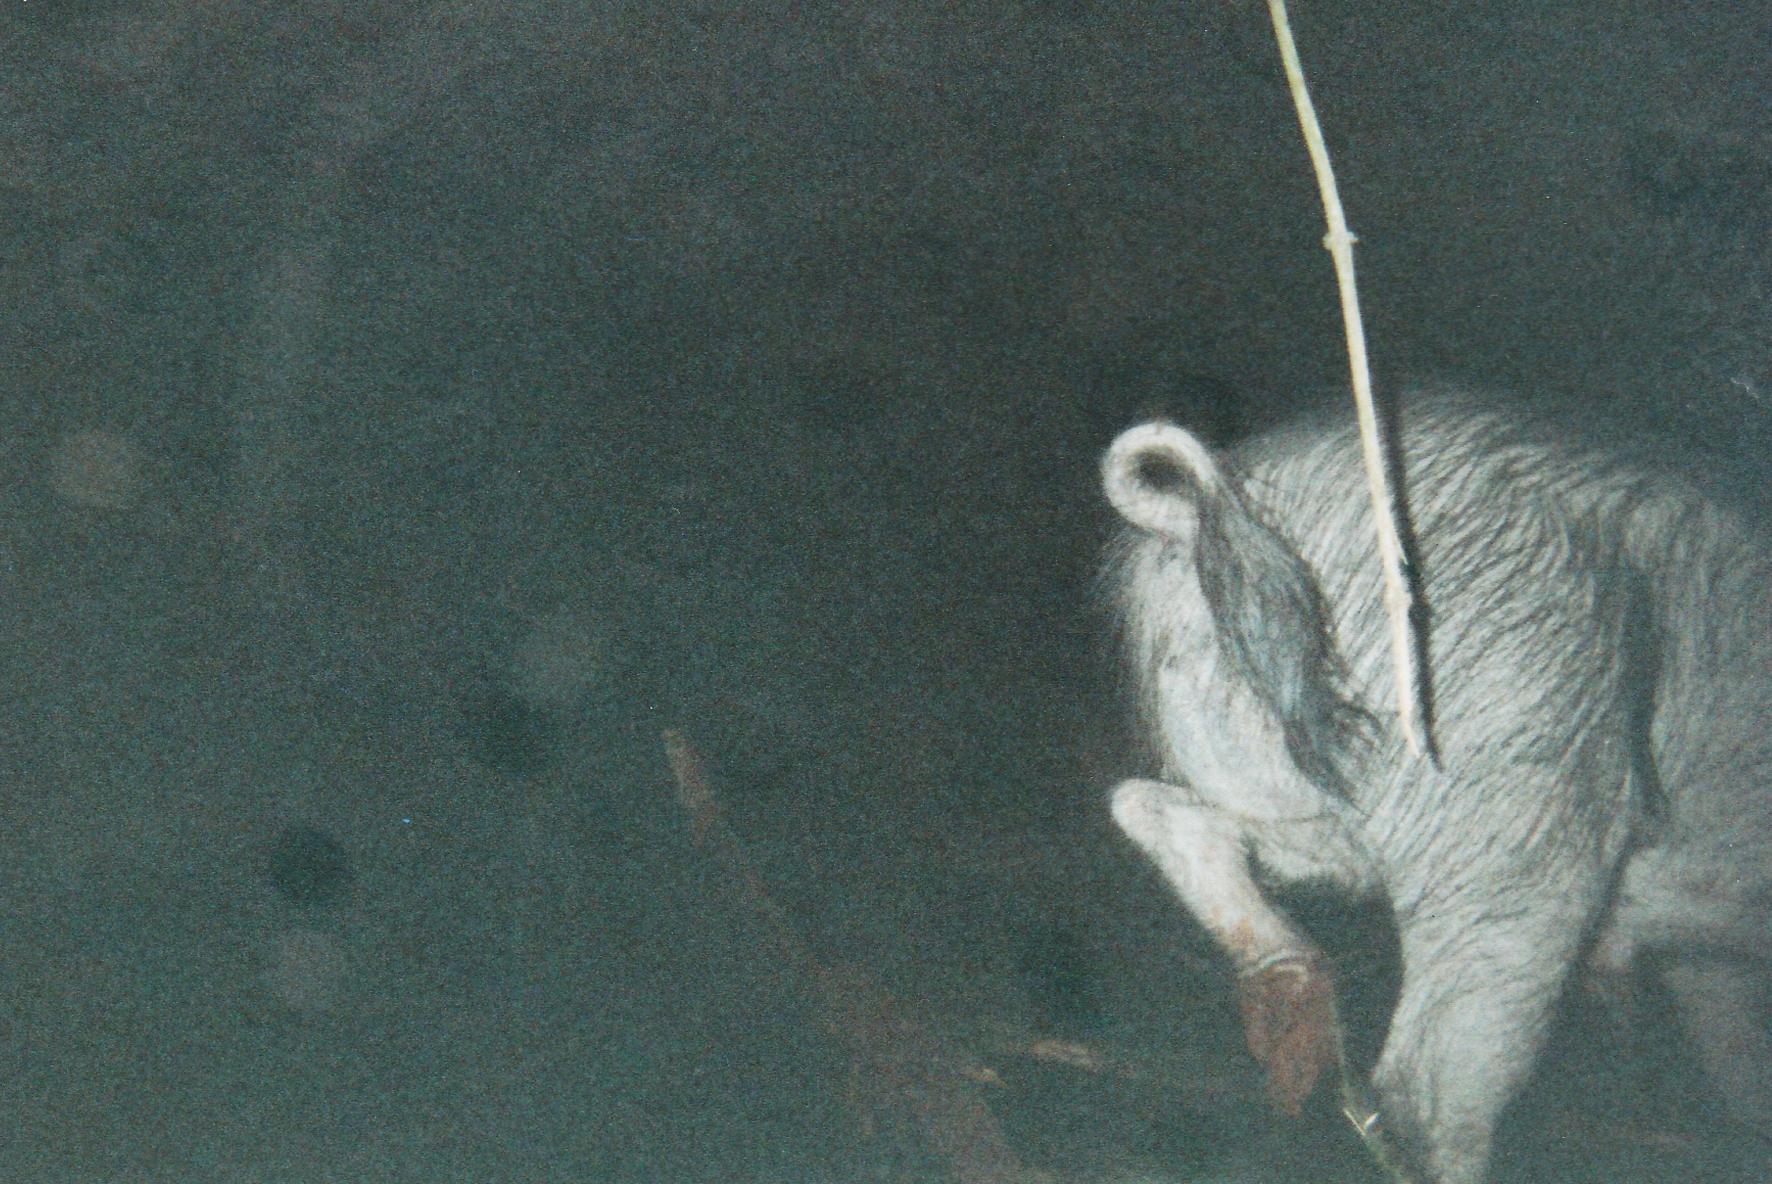 Wild Boar Photos 38.jpg